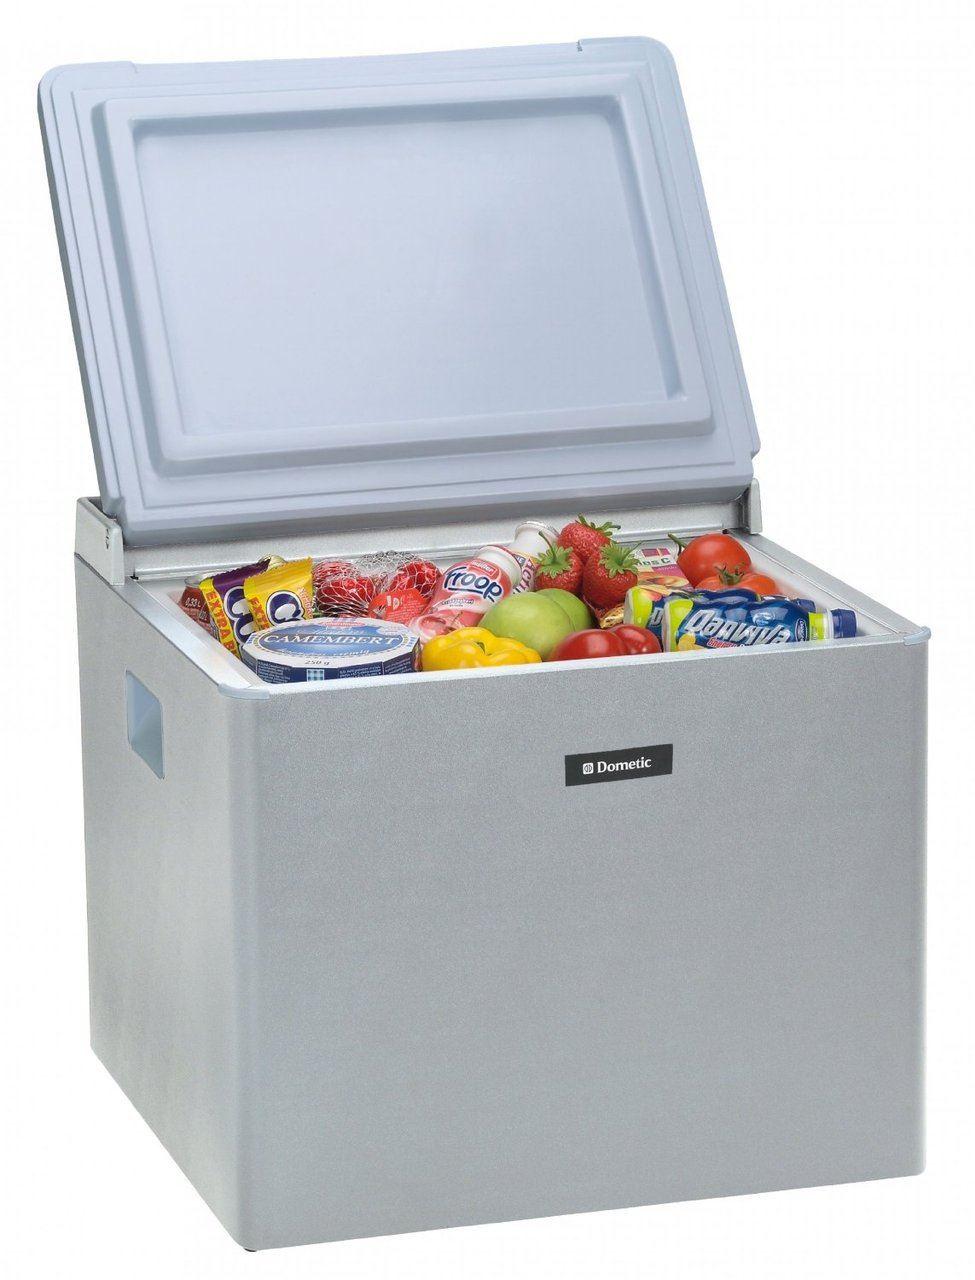 dometic combicool rc1200 3 way portable camping fridge lpg. Black Bedroom Furniture Sets. Home Design Ideas